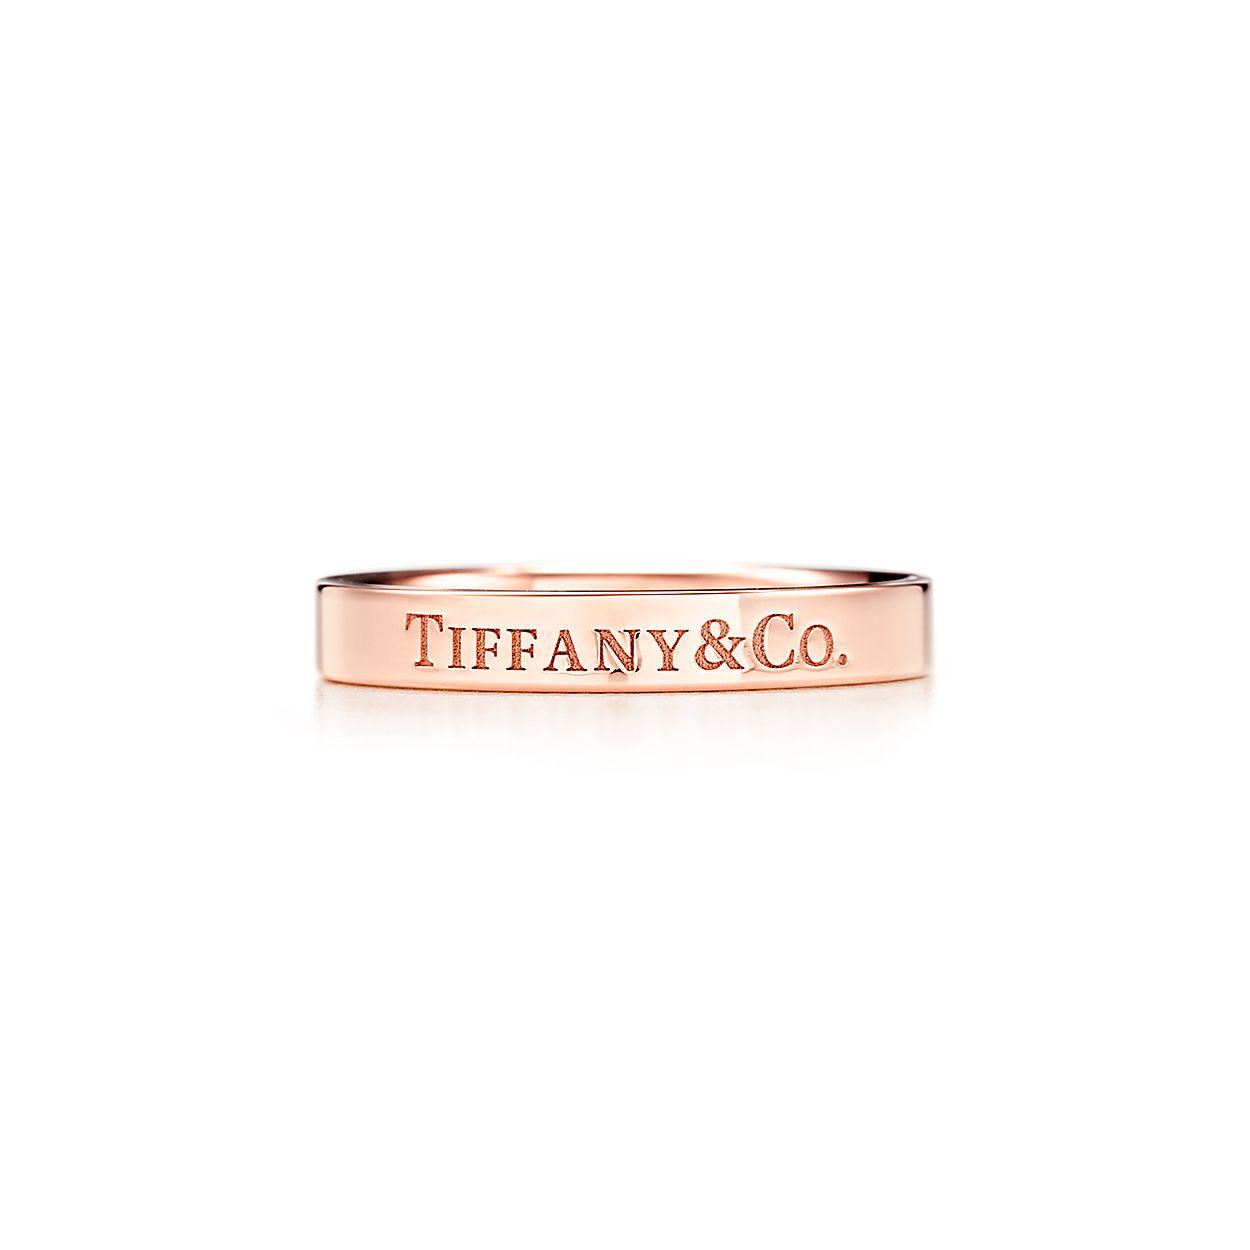 8ad5dbcafdffa Tiffany & Co.® Band Ring